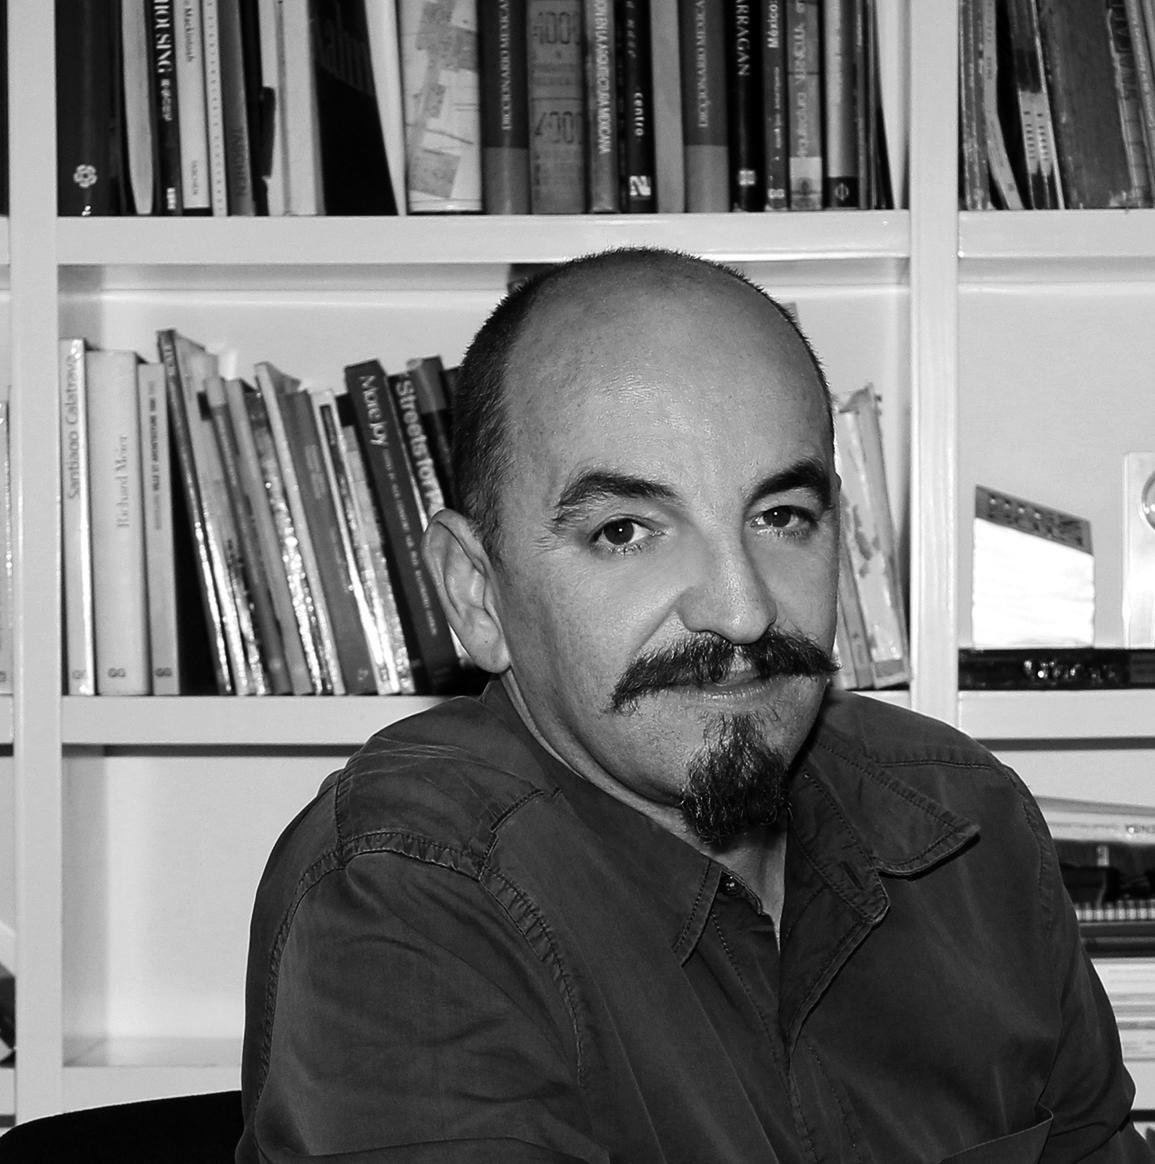 Antonio Plá